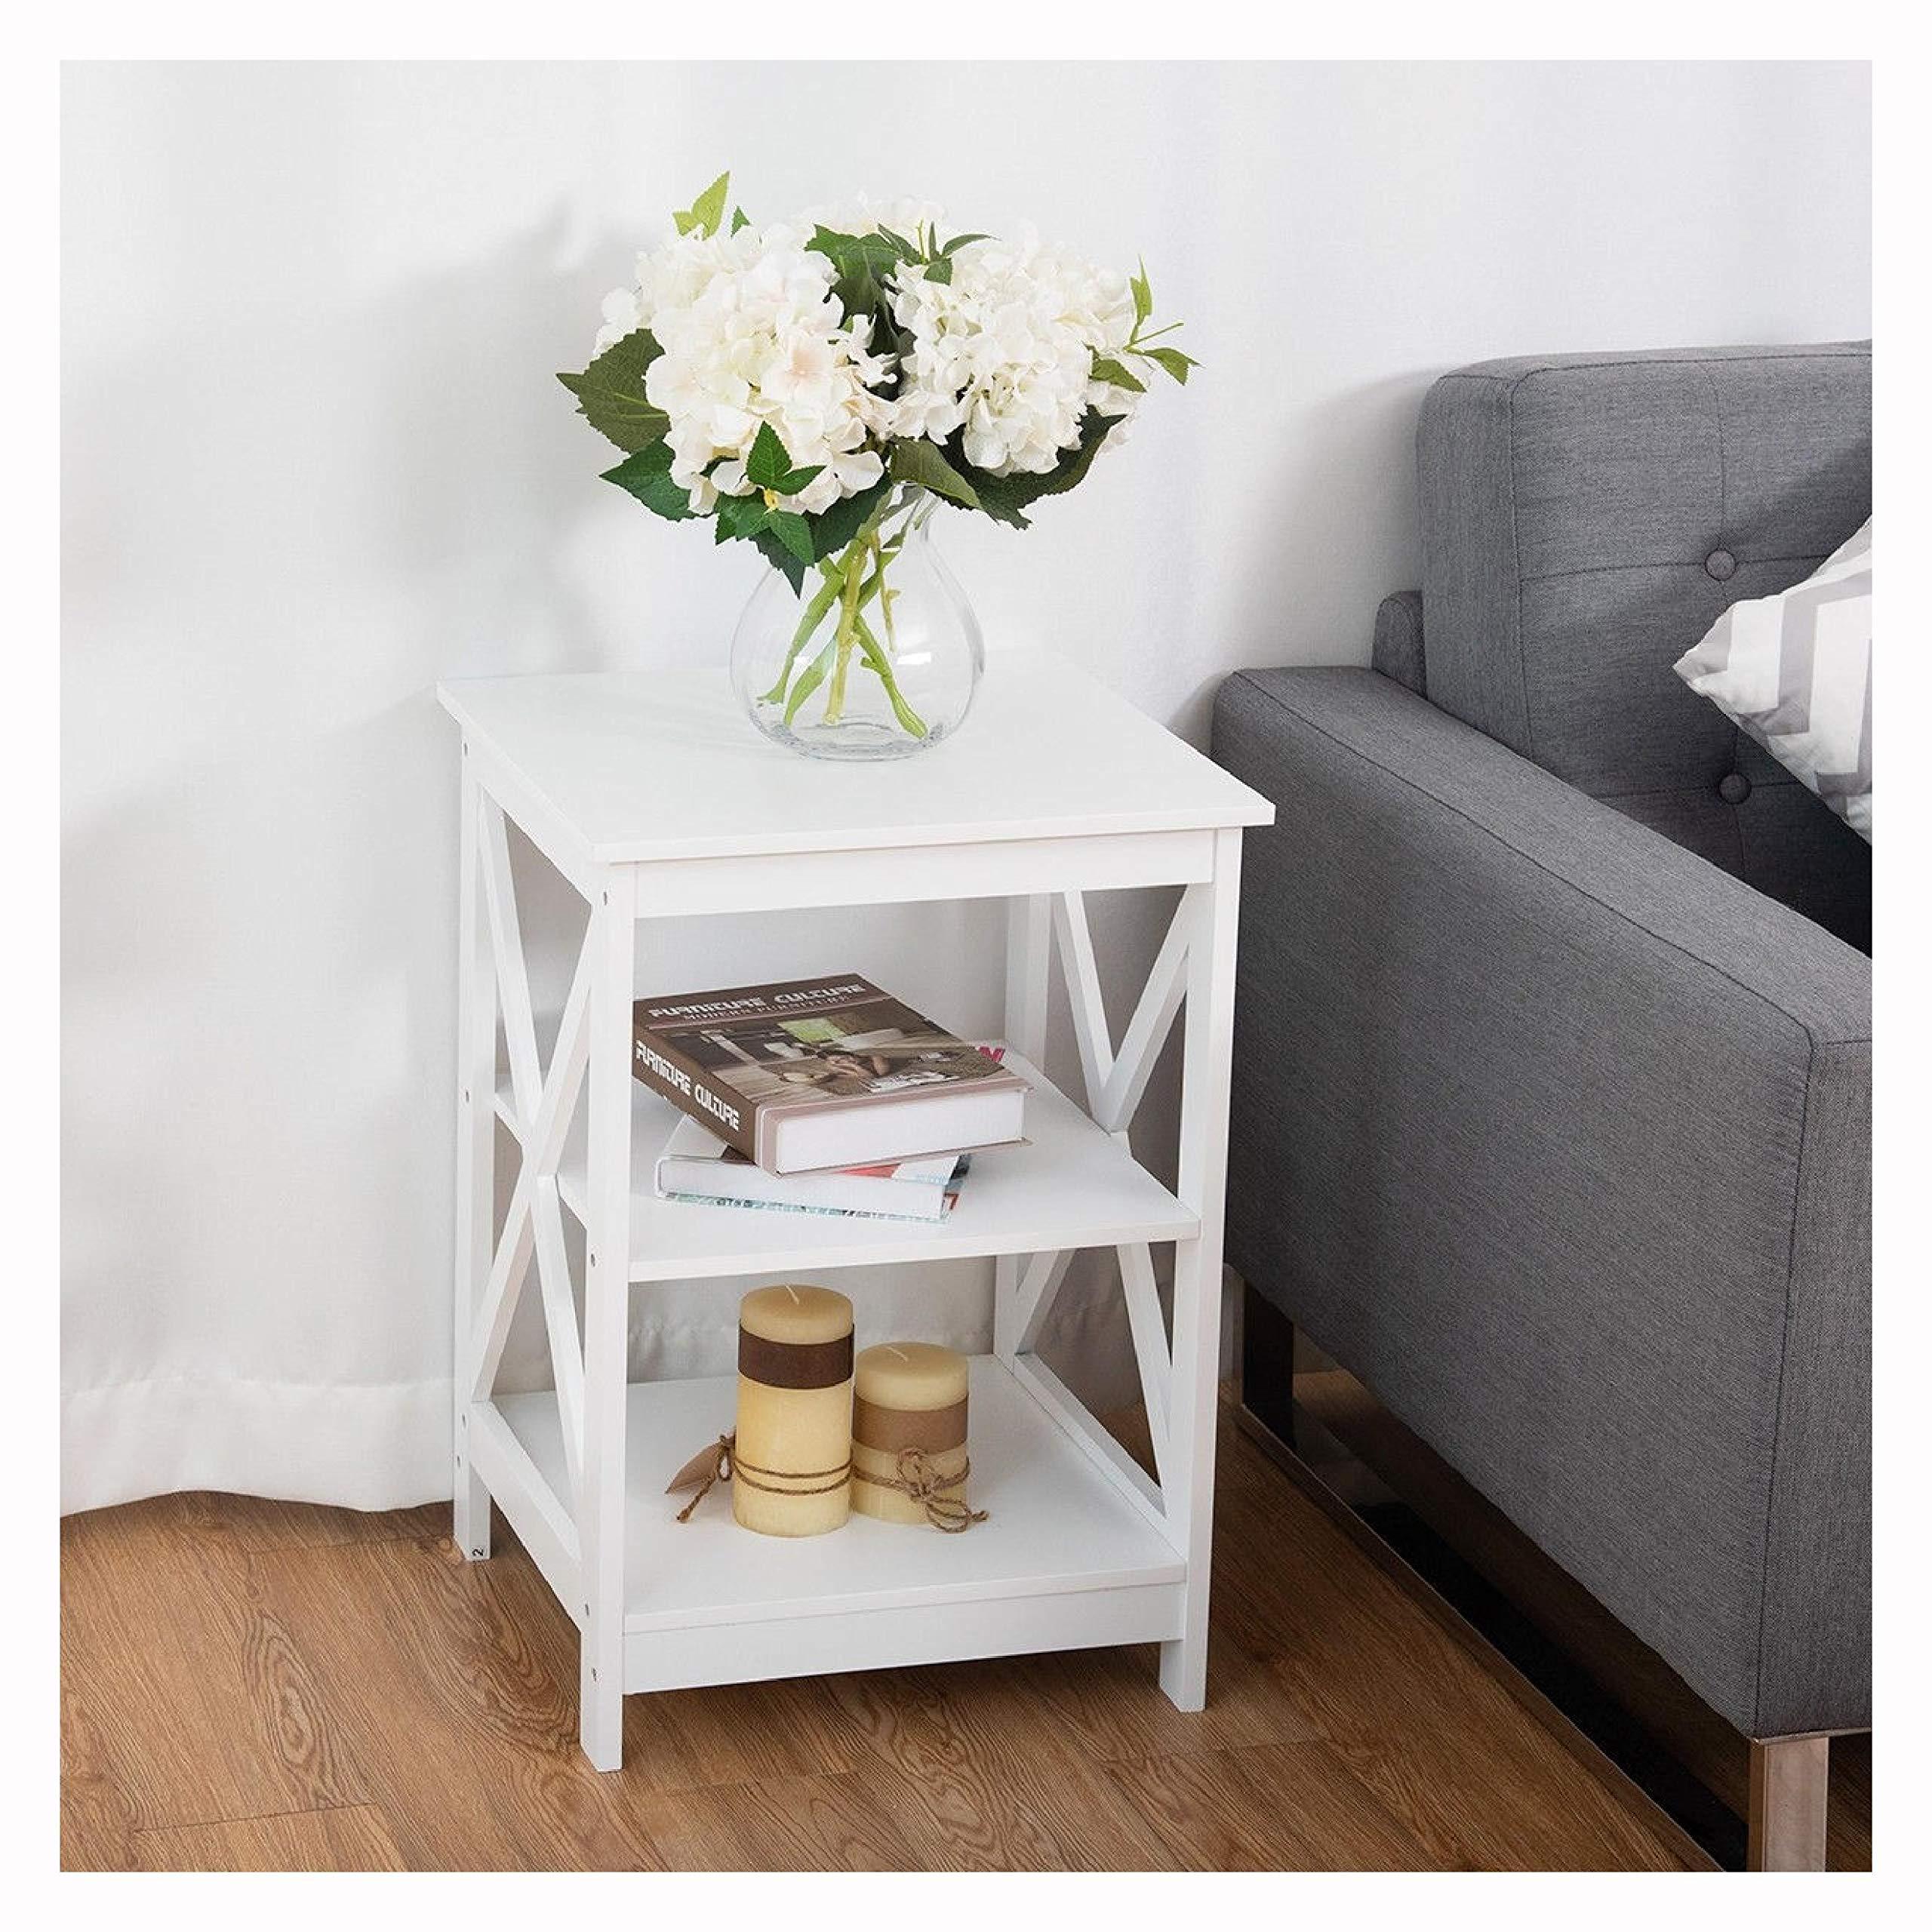 End Table, 3-Tier Living Room Display Storage Shelf Nightstand, White